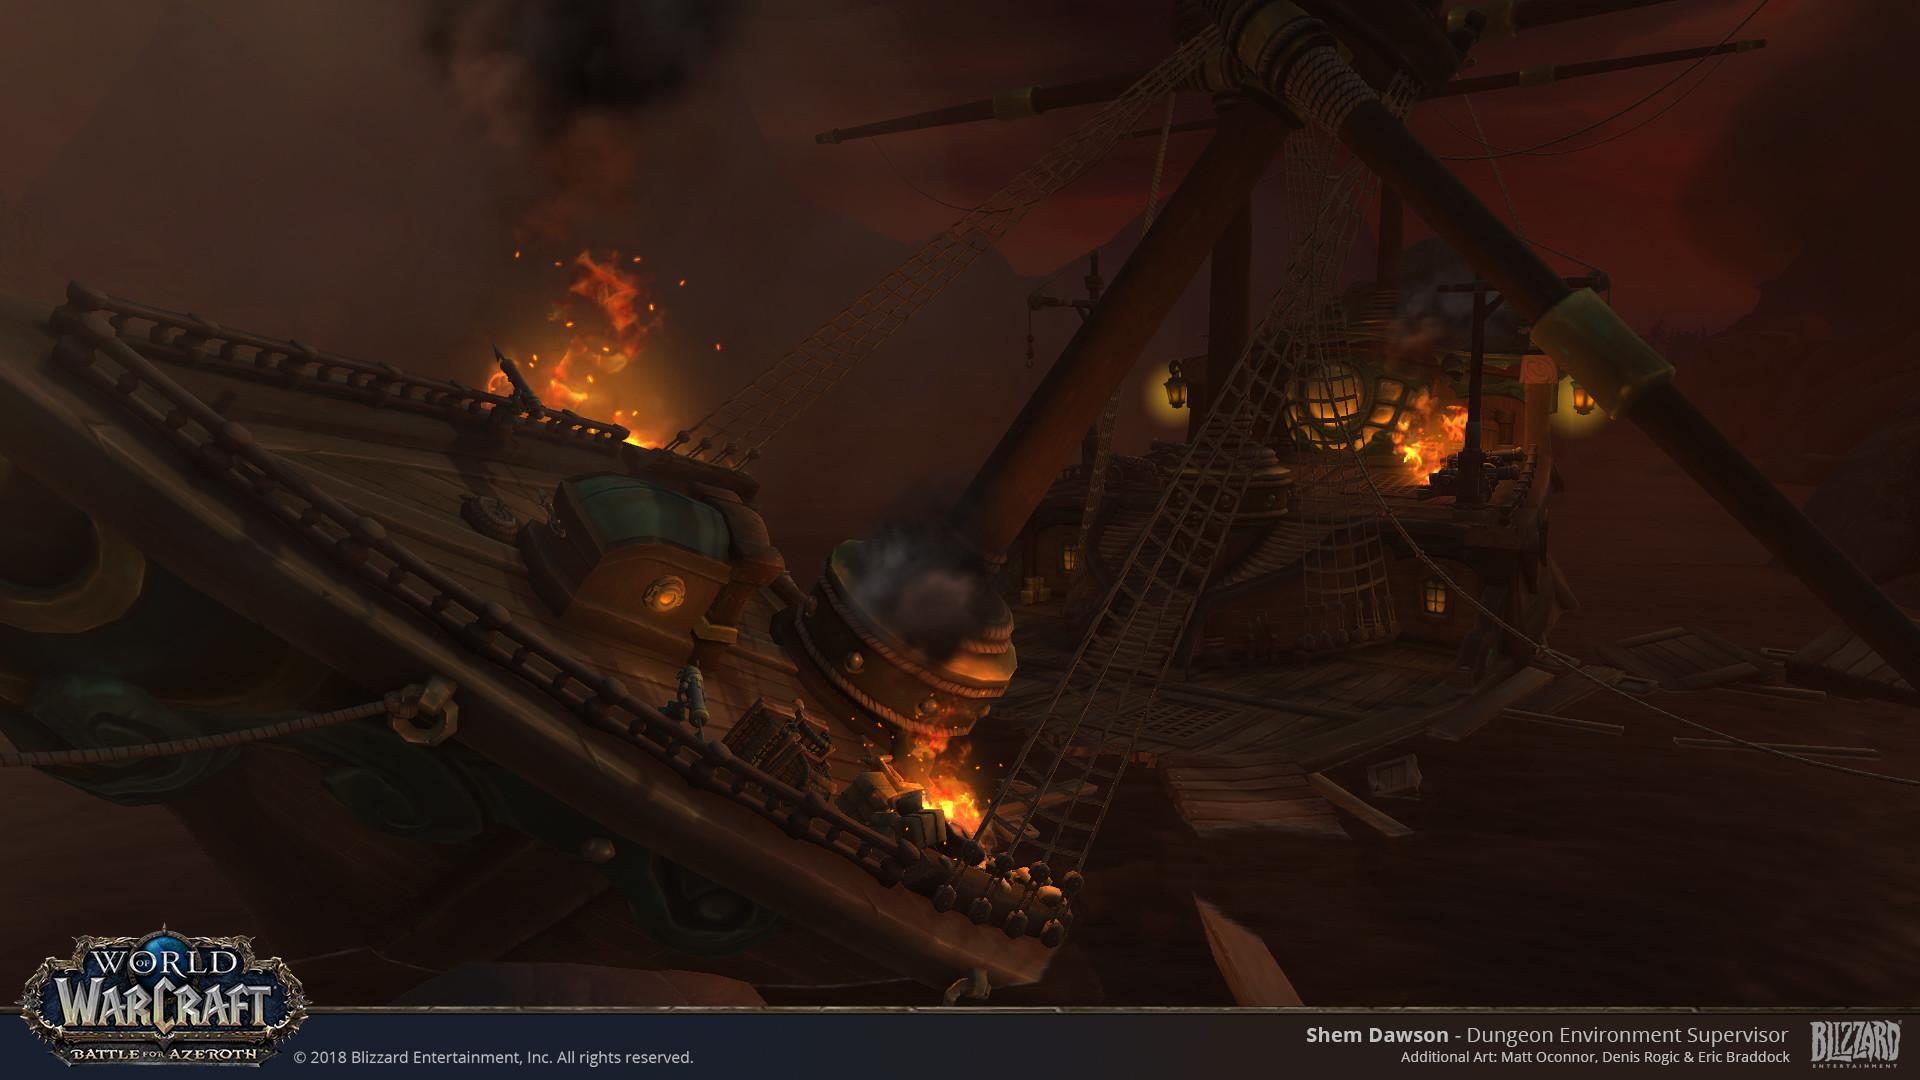 Shem dawson shem dawson shipwreck04